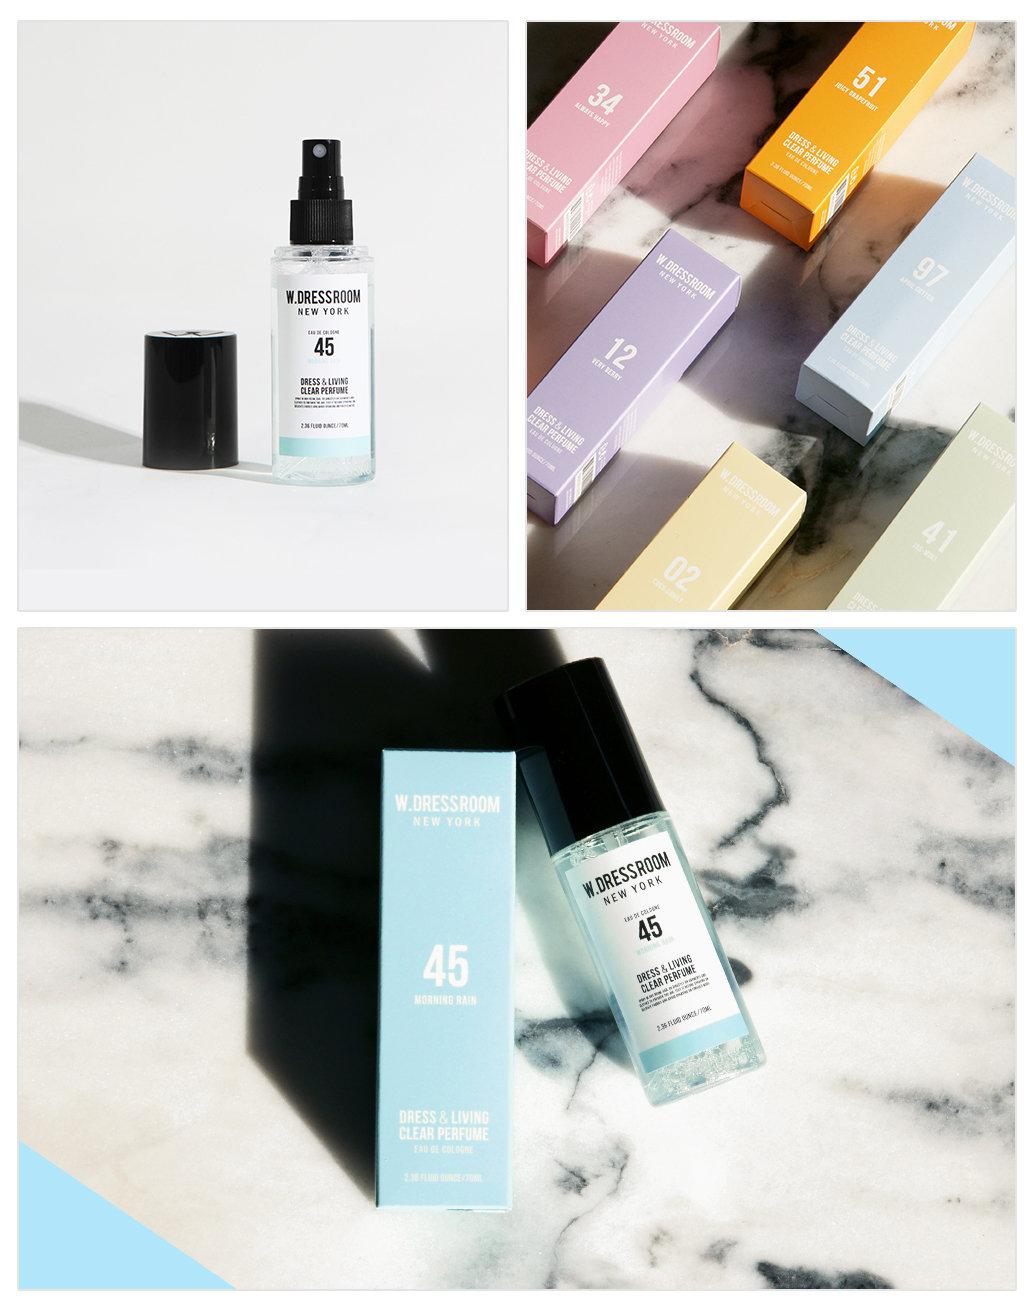 Photo. Description. DESCRIPTION Brand: W. Dressroom Product: W. Dressroom Dress & Living Clear Perfume #45 Morning Rain 70ml